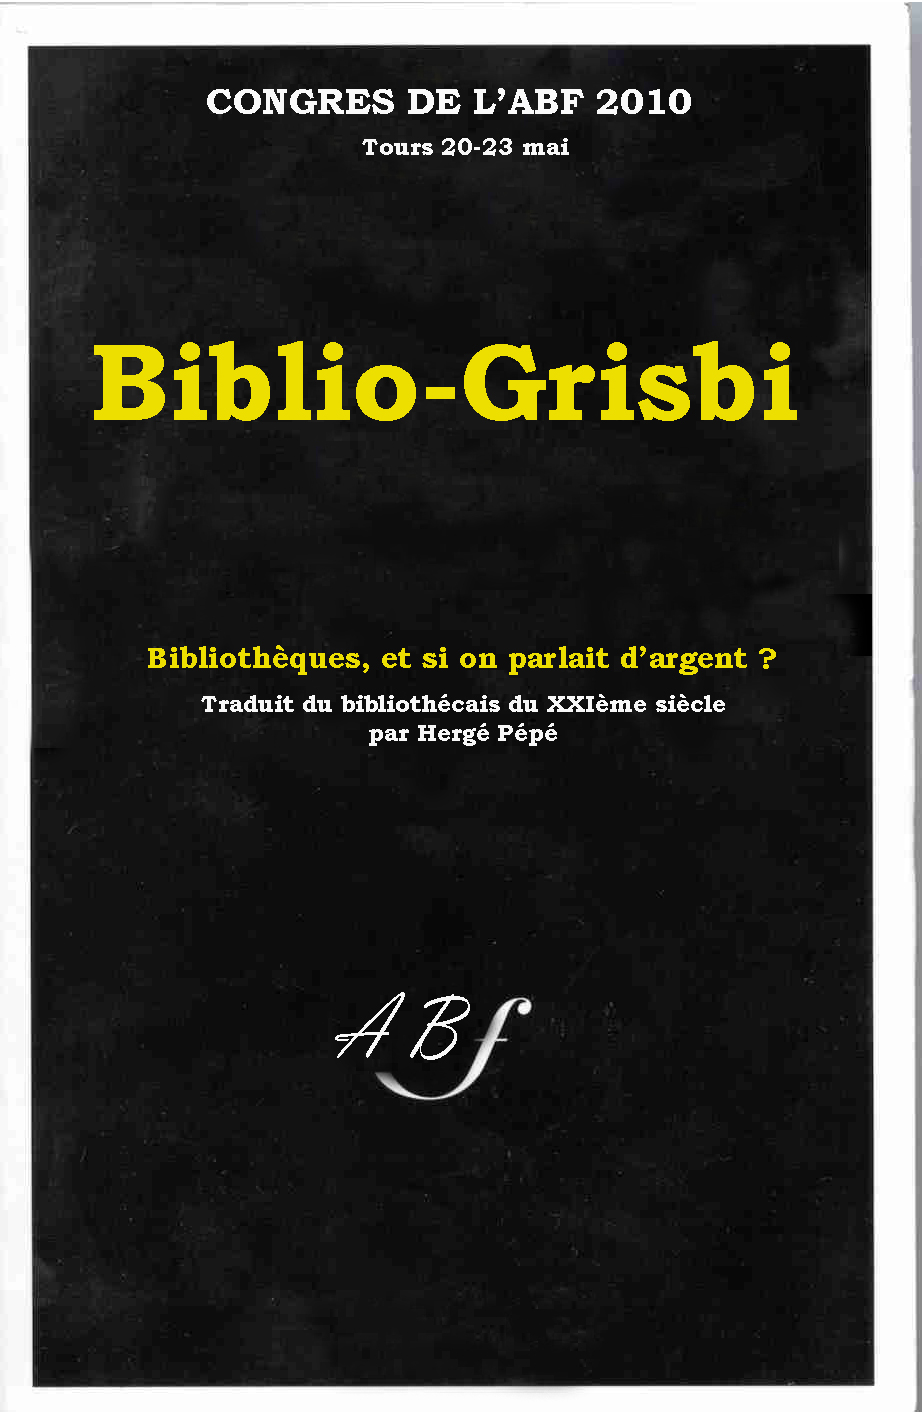 http://bibliofrance.org/images/stories/2010/bibliogrisbi.jpg